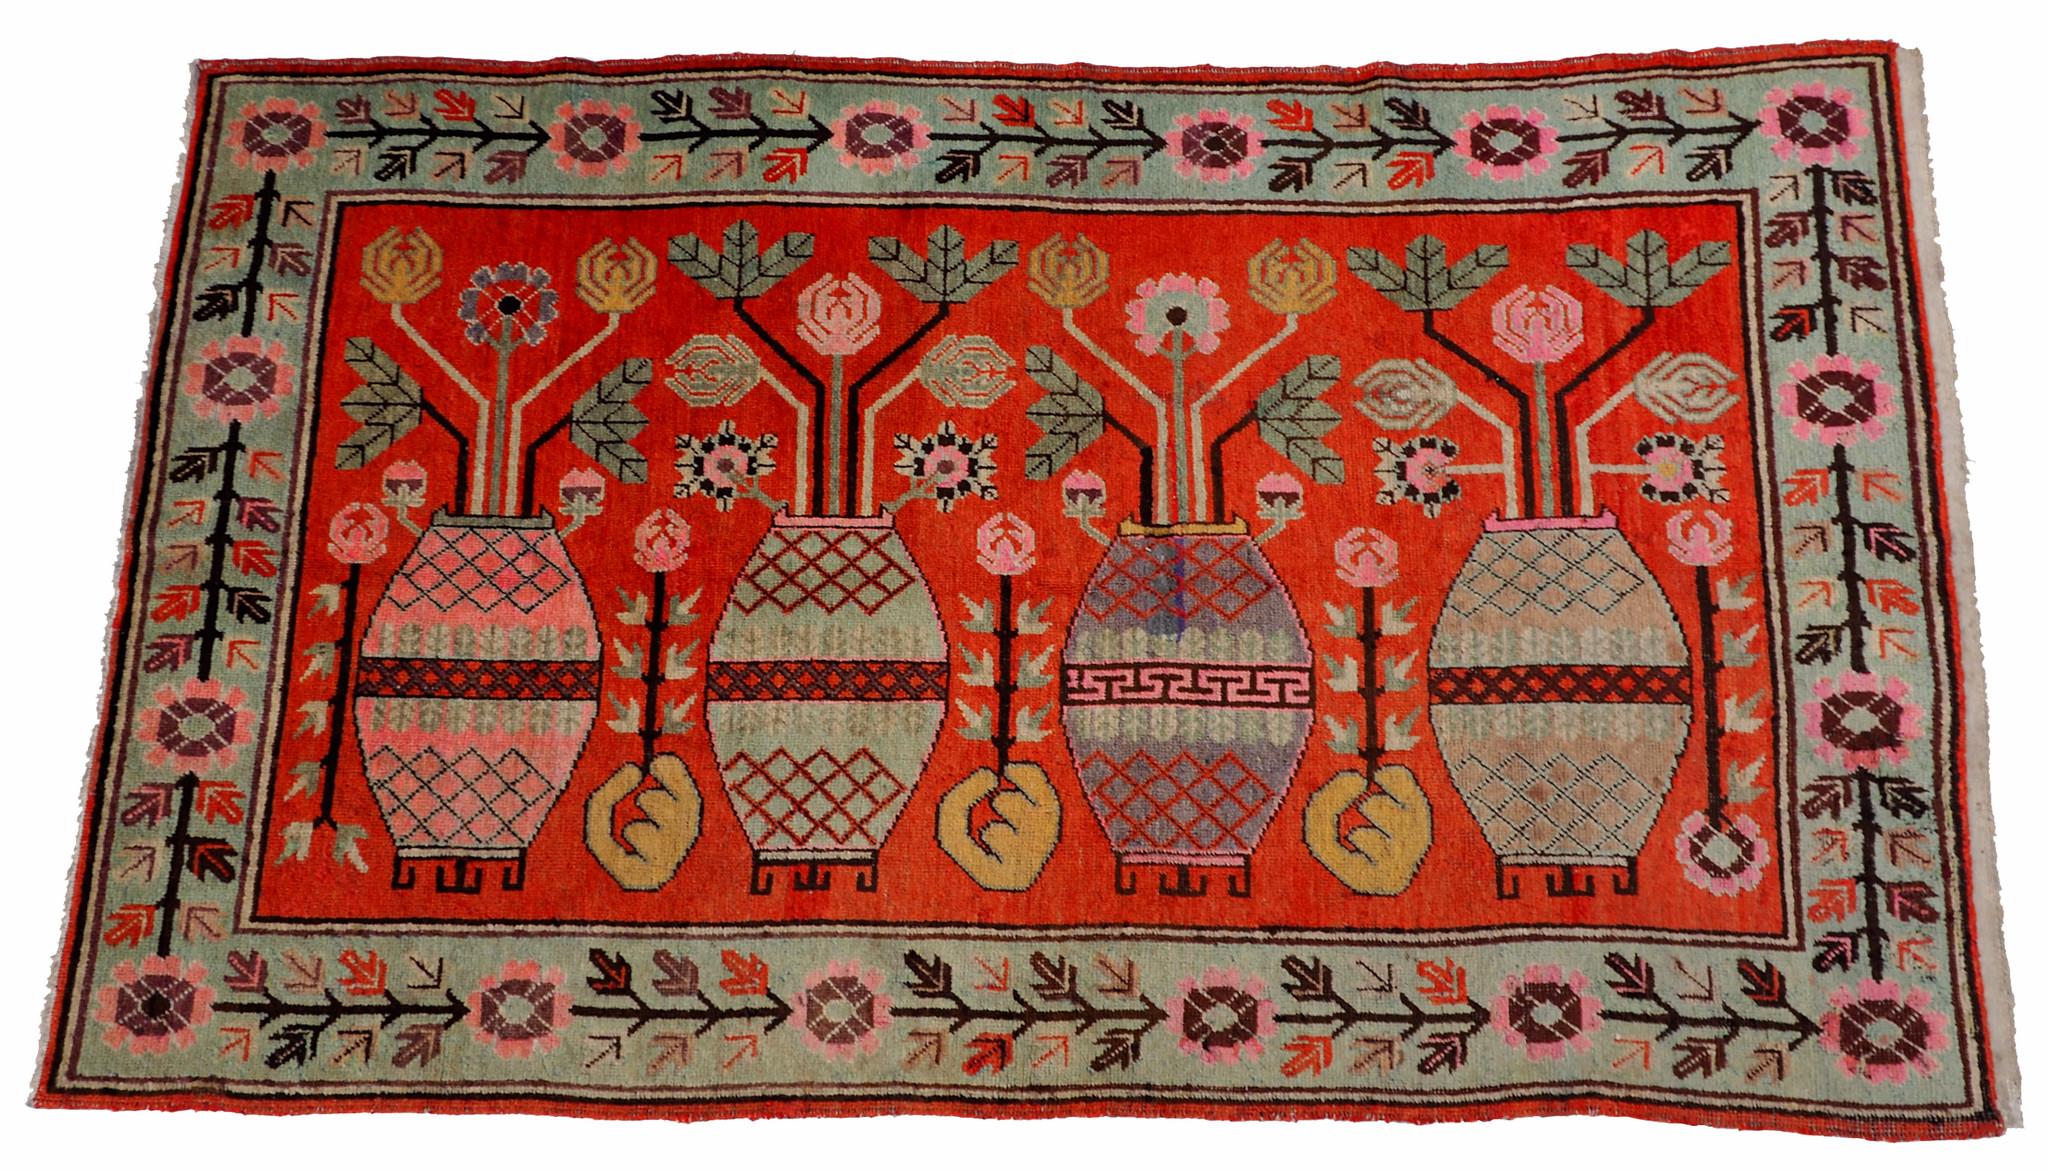 260x150 cm original antique Khotan Samarkand rug Chinese Turkestan hand knotted carpet No:21/42